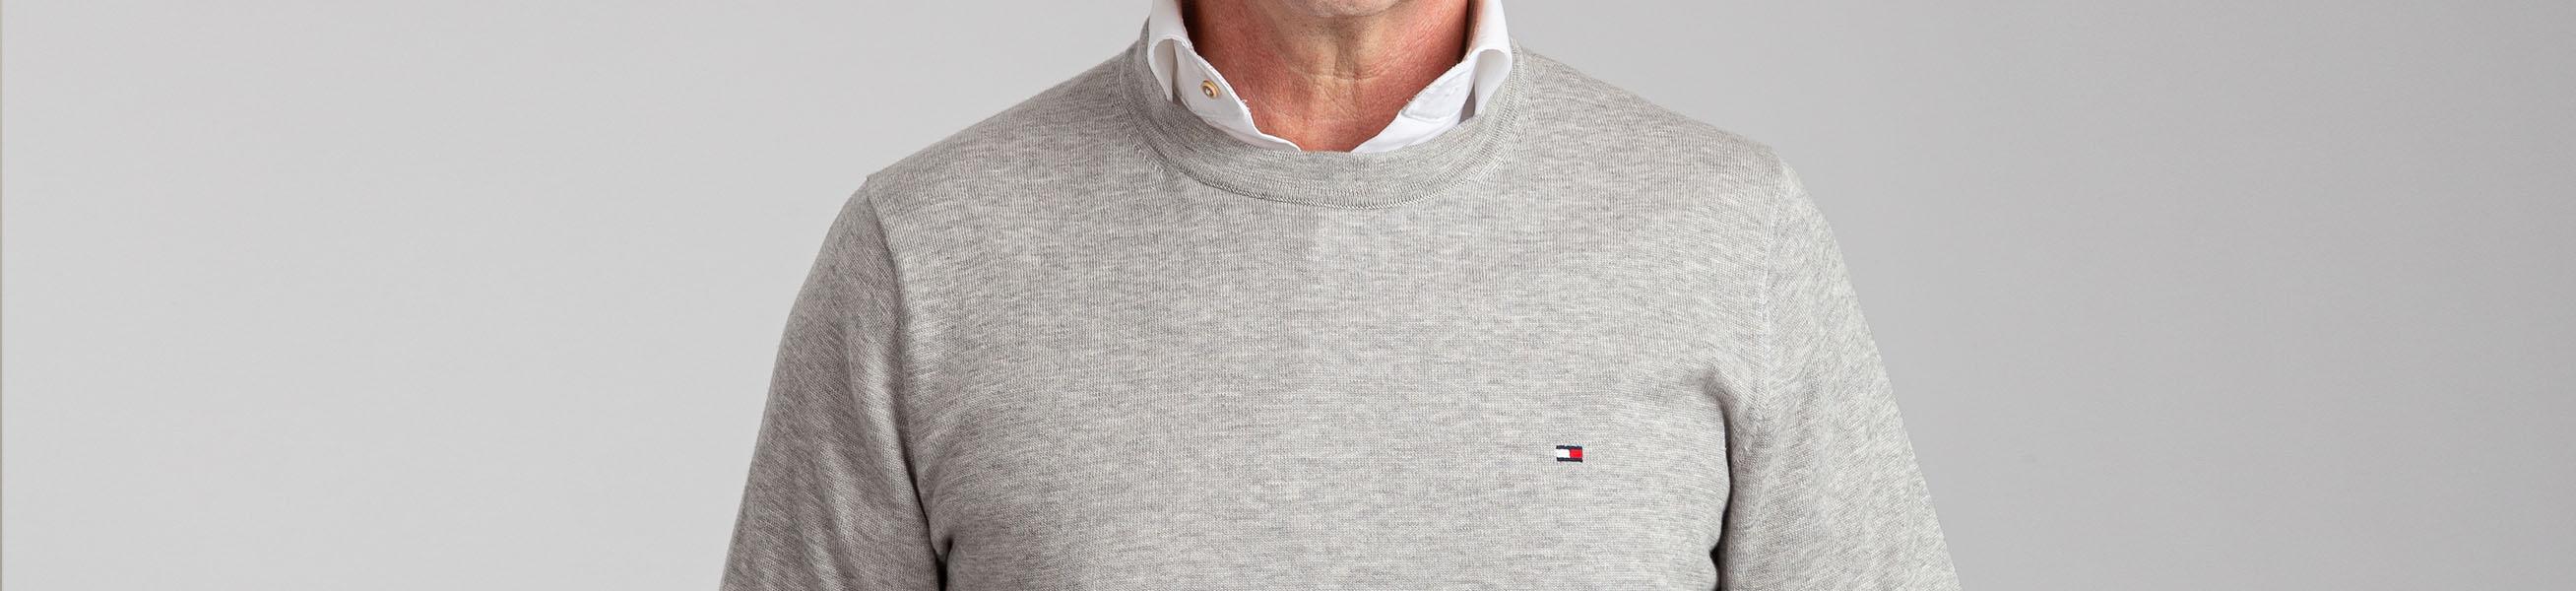 Tommy Hilfiger Truien & Sweaters